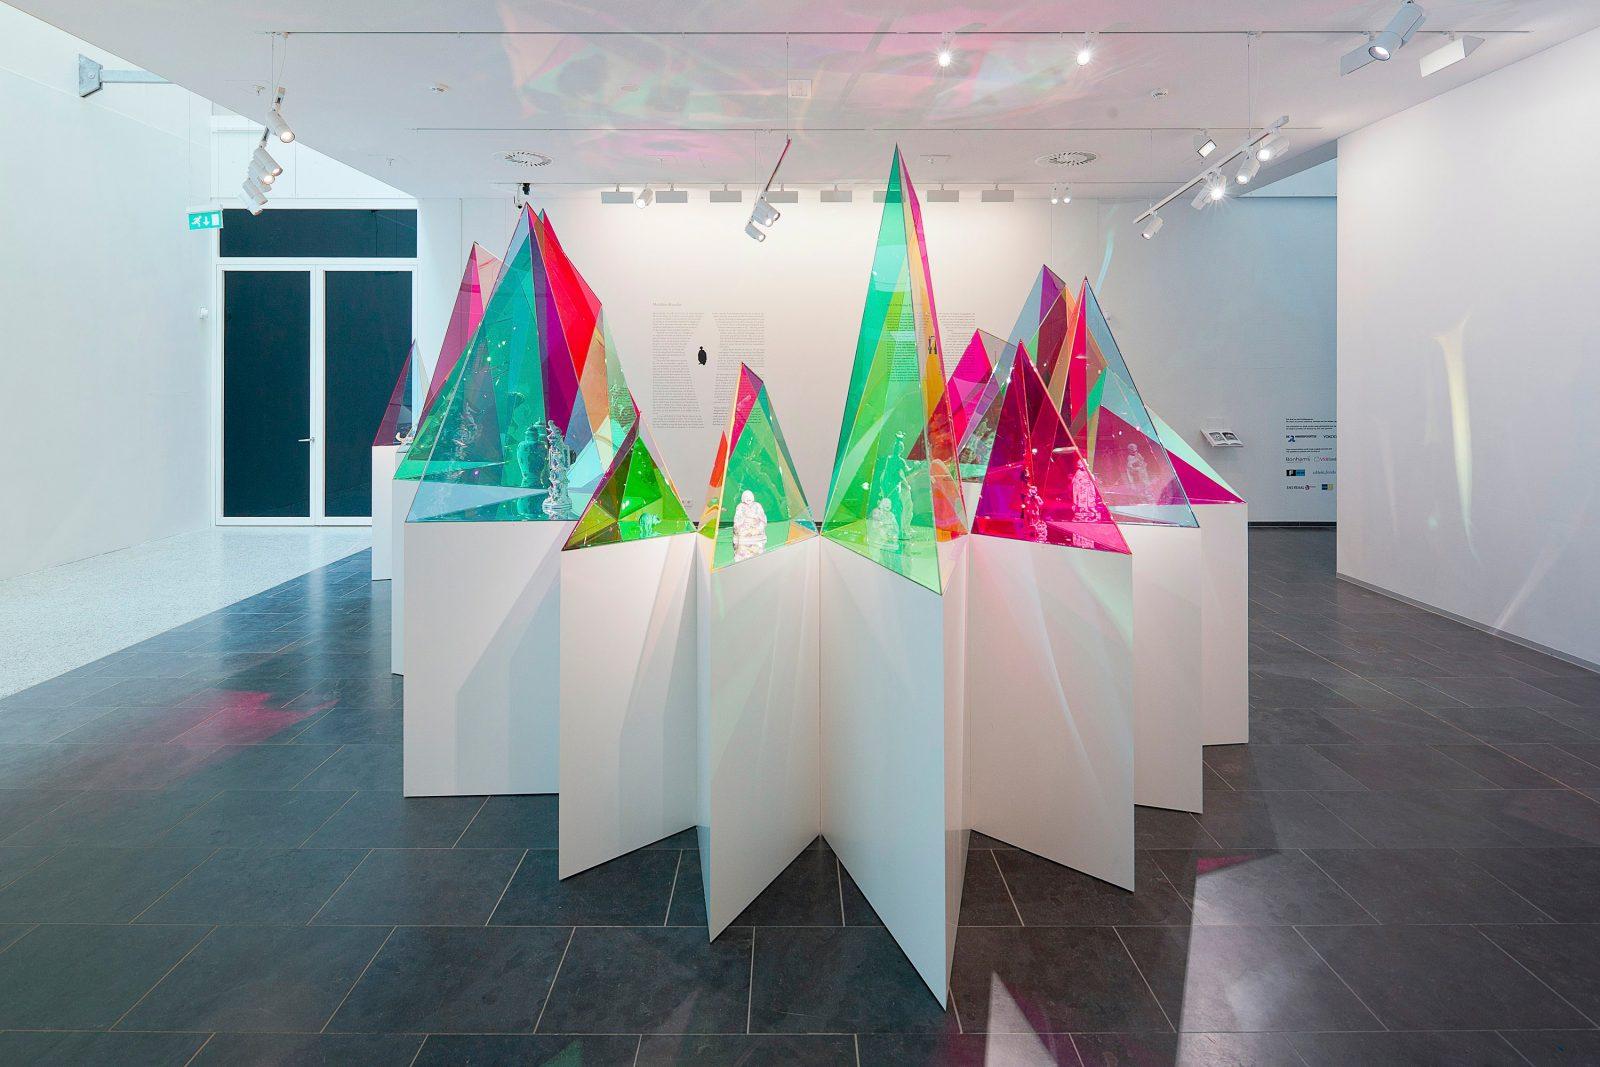 SO–IL x Meissen installation detail at Kunsthal KAdE, Amersfoort, The Netherlands